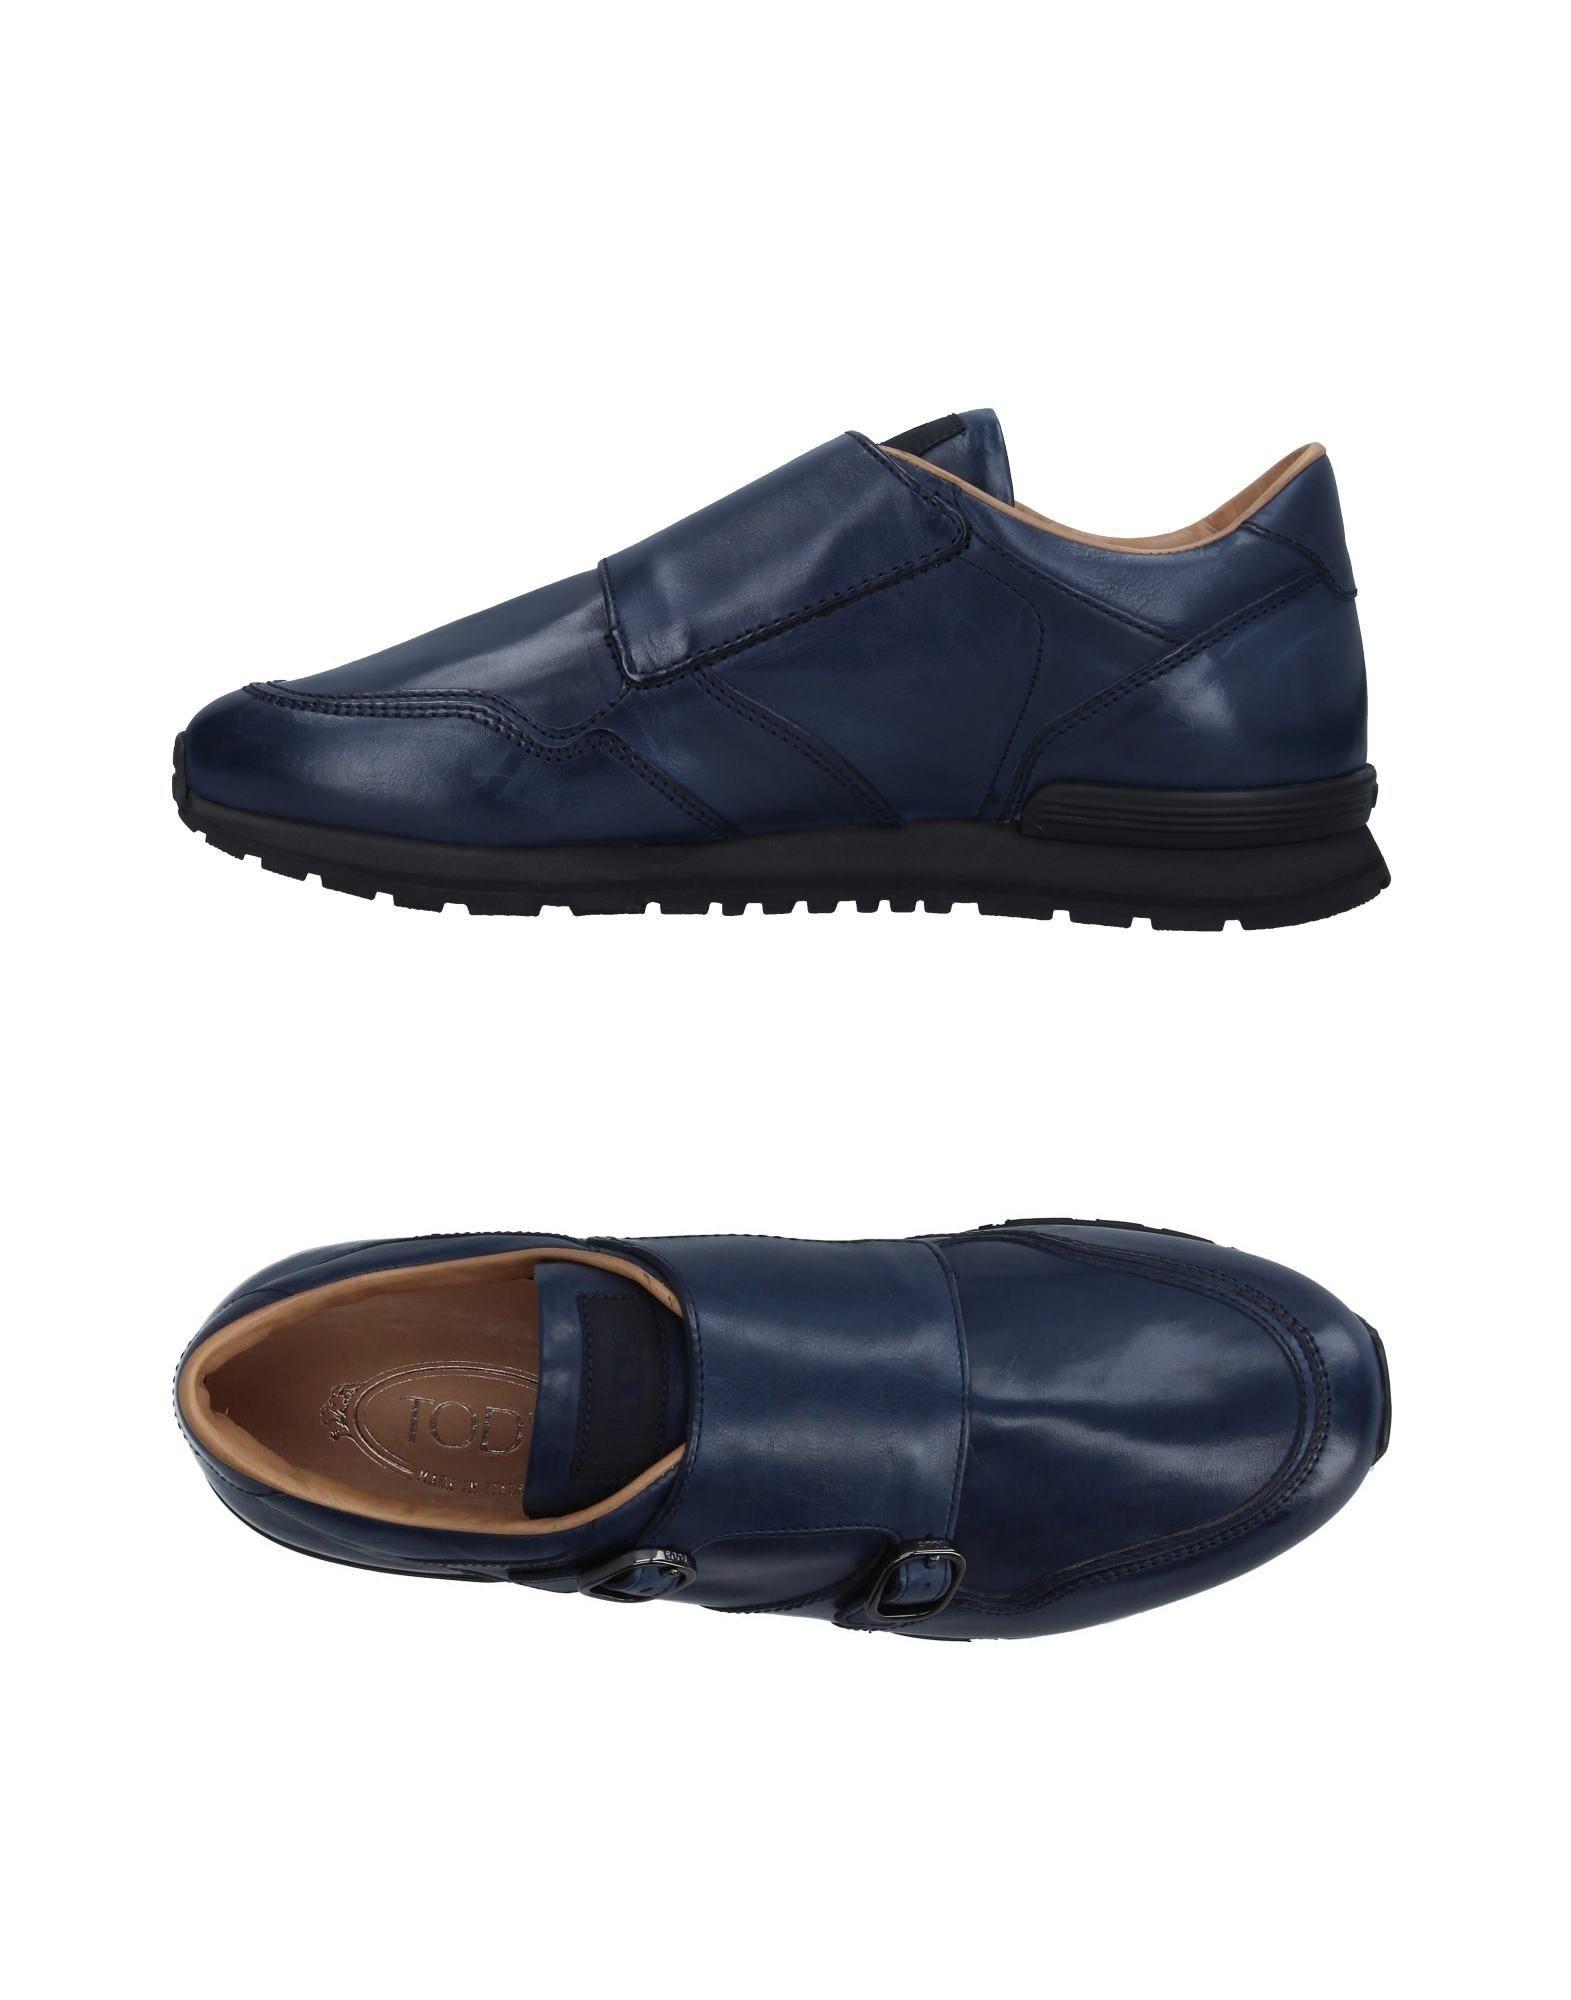 brooks низкие кеды и кроссовки TOD'S Низкие кеды и кроссовки